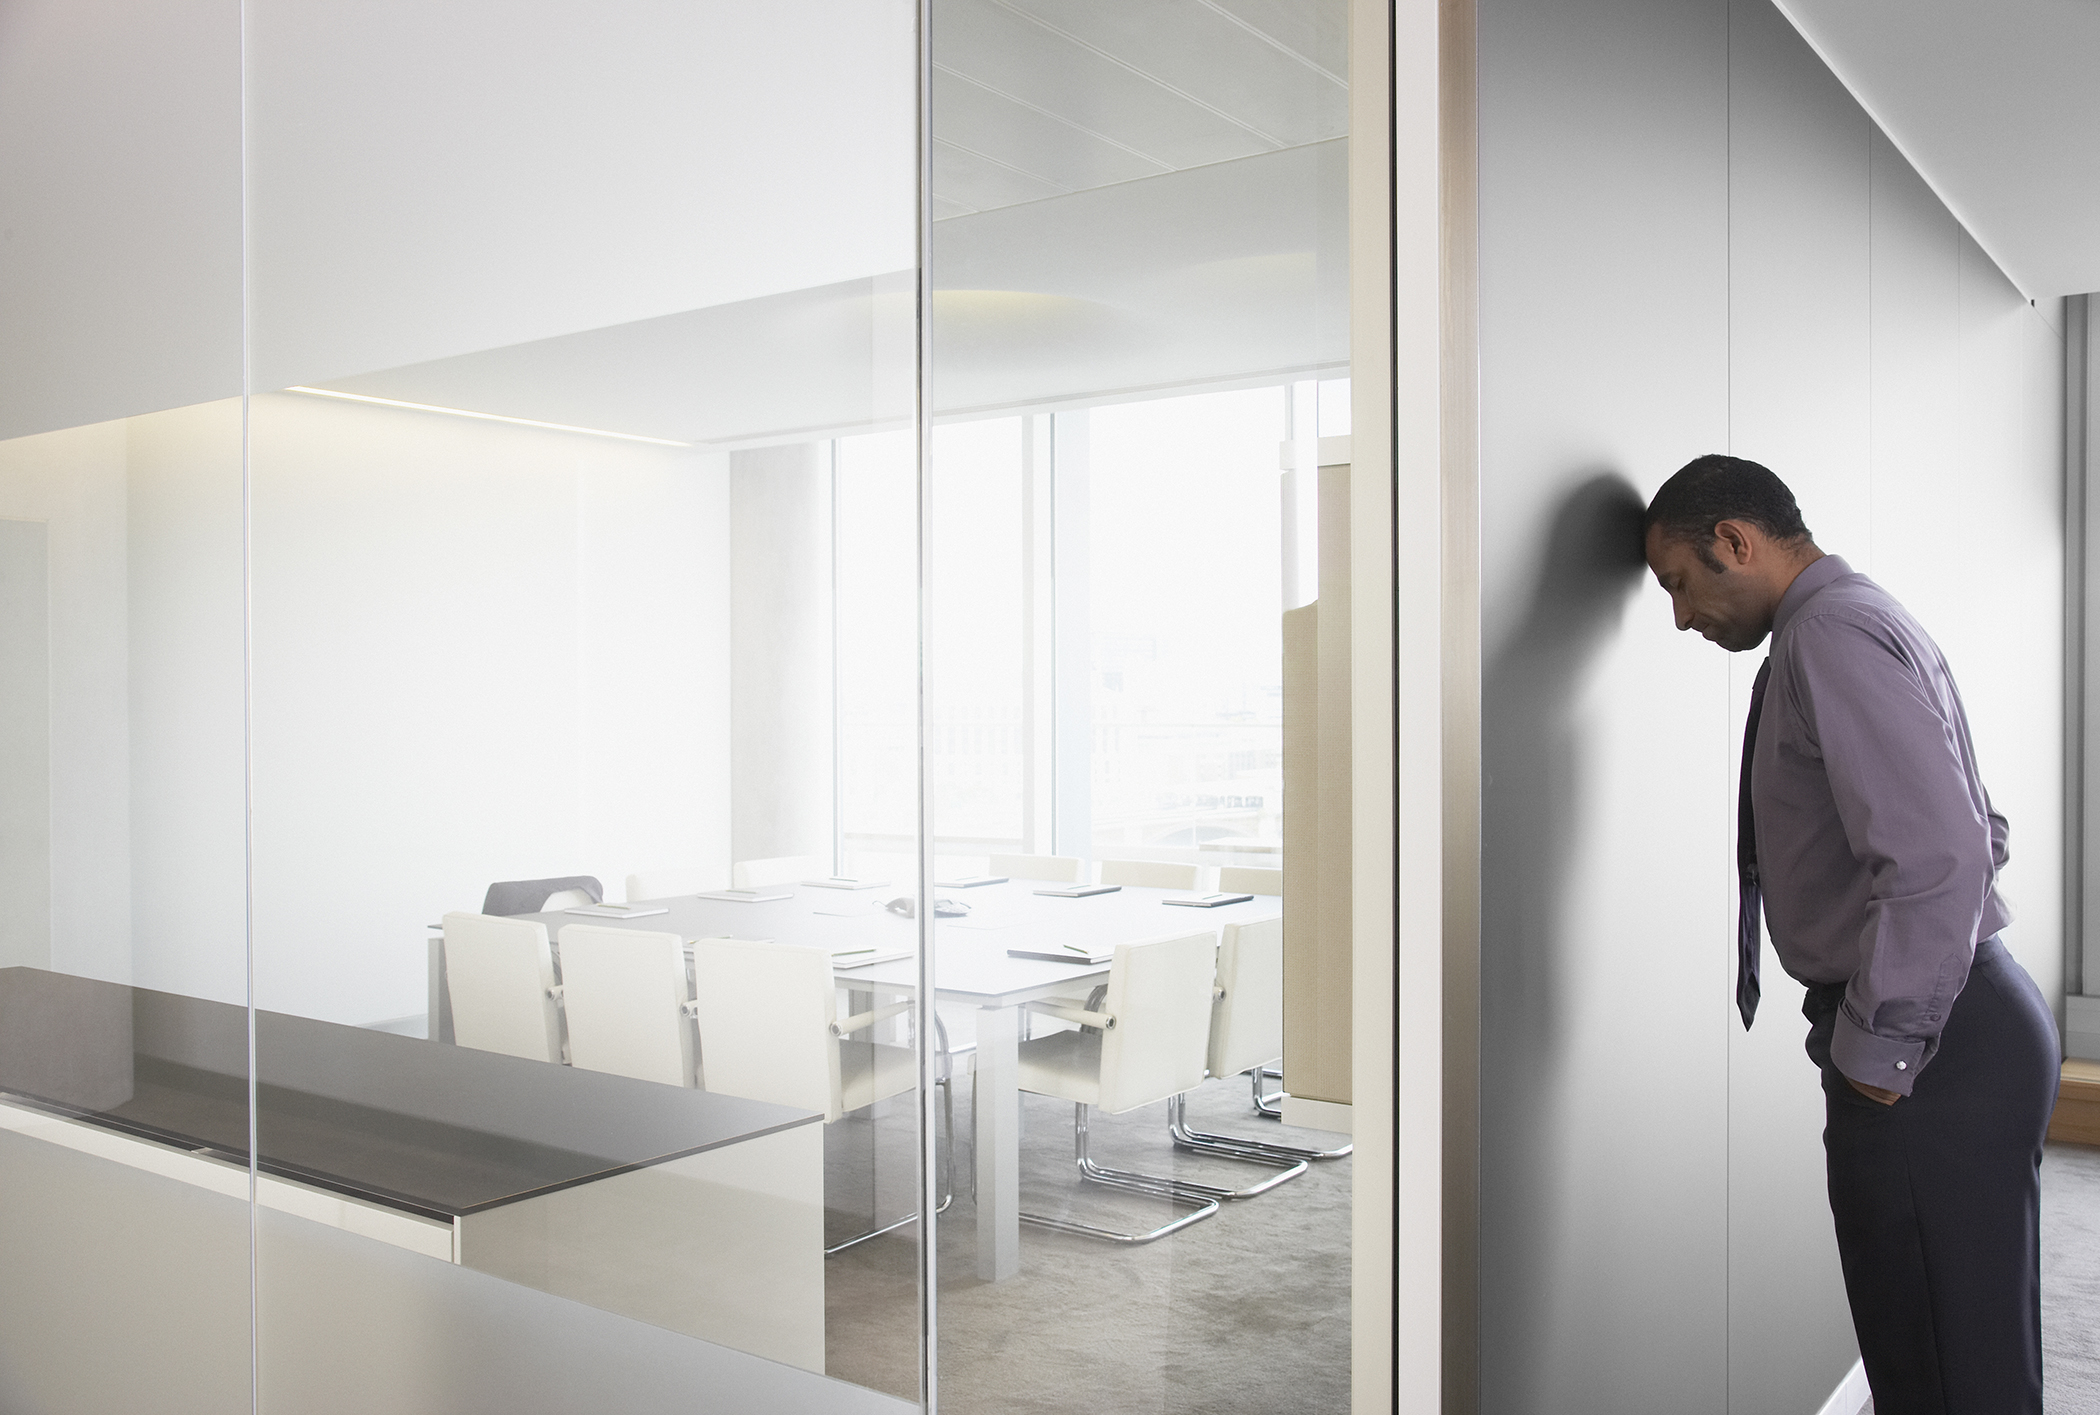 Businessman leaning on corridor wall